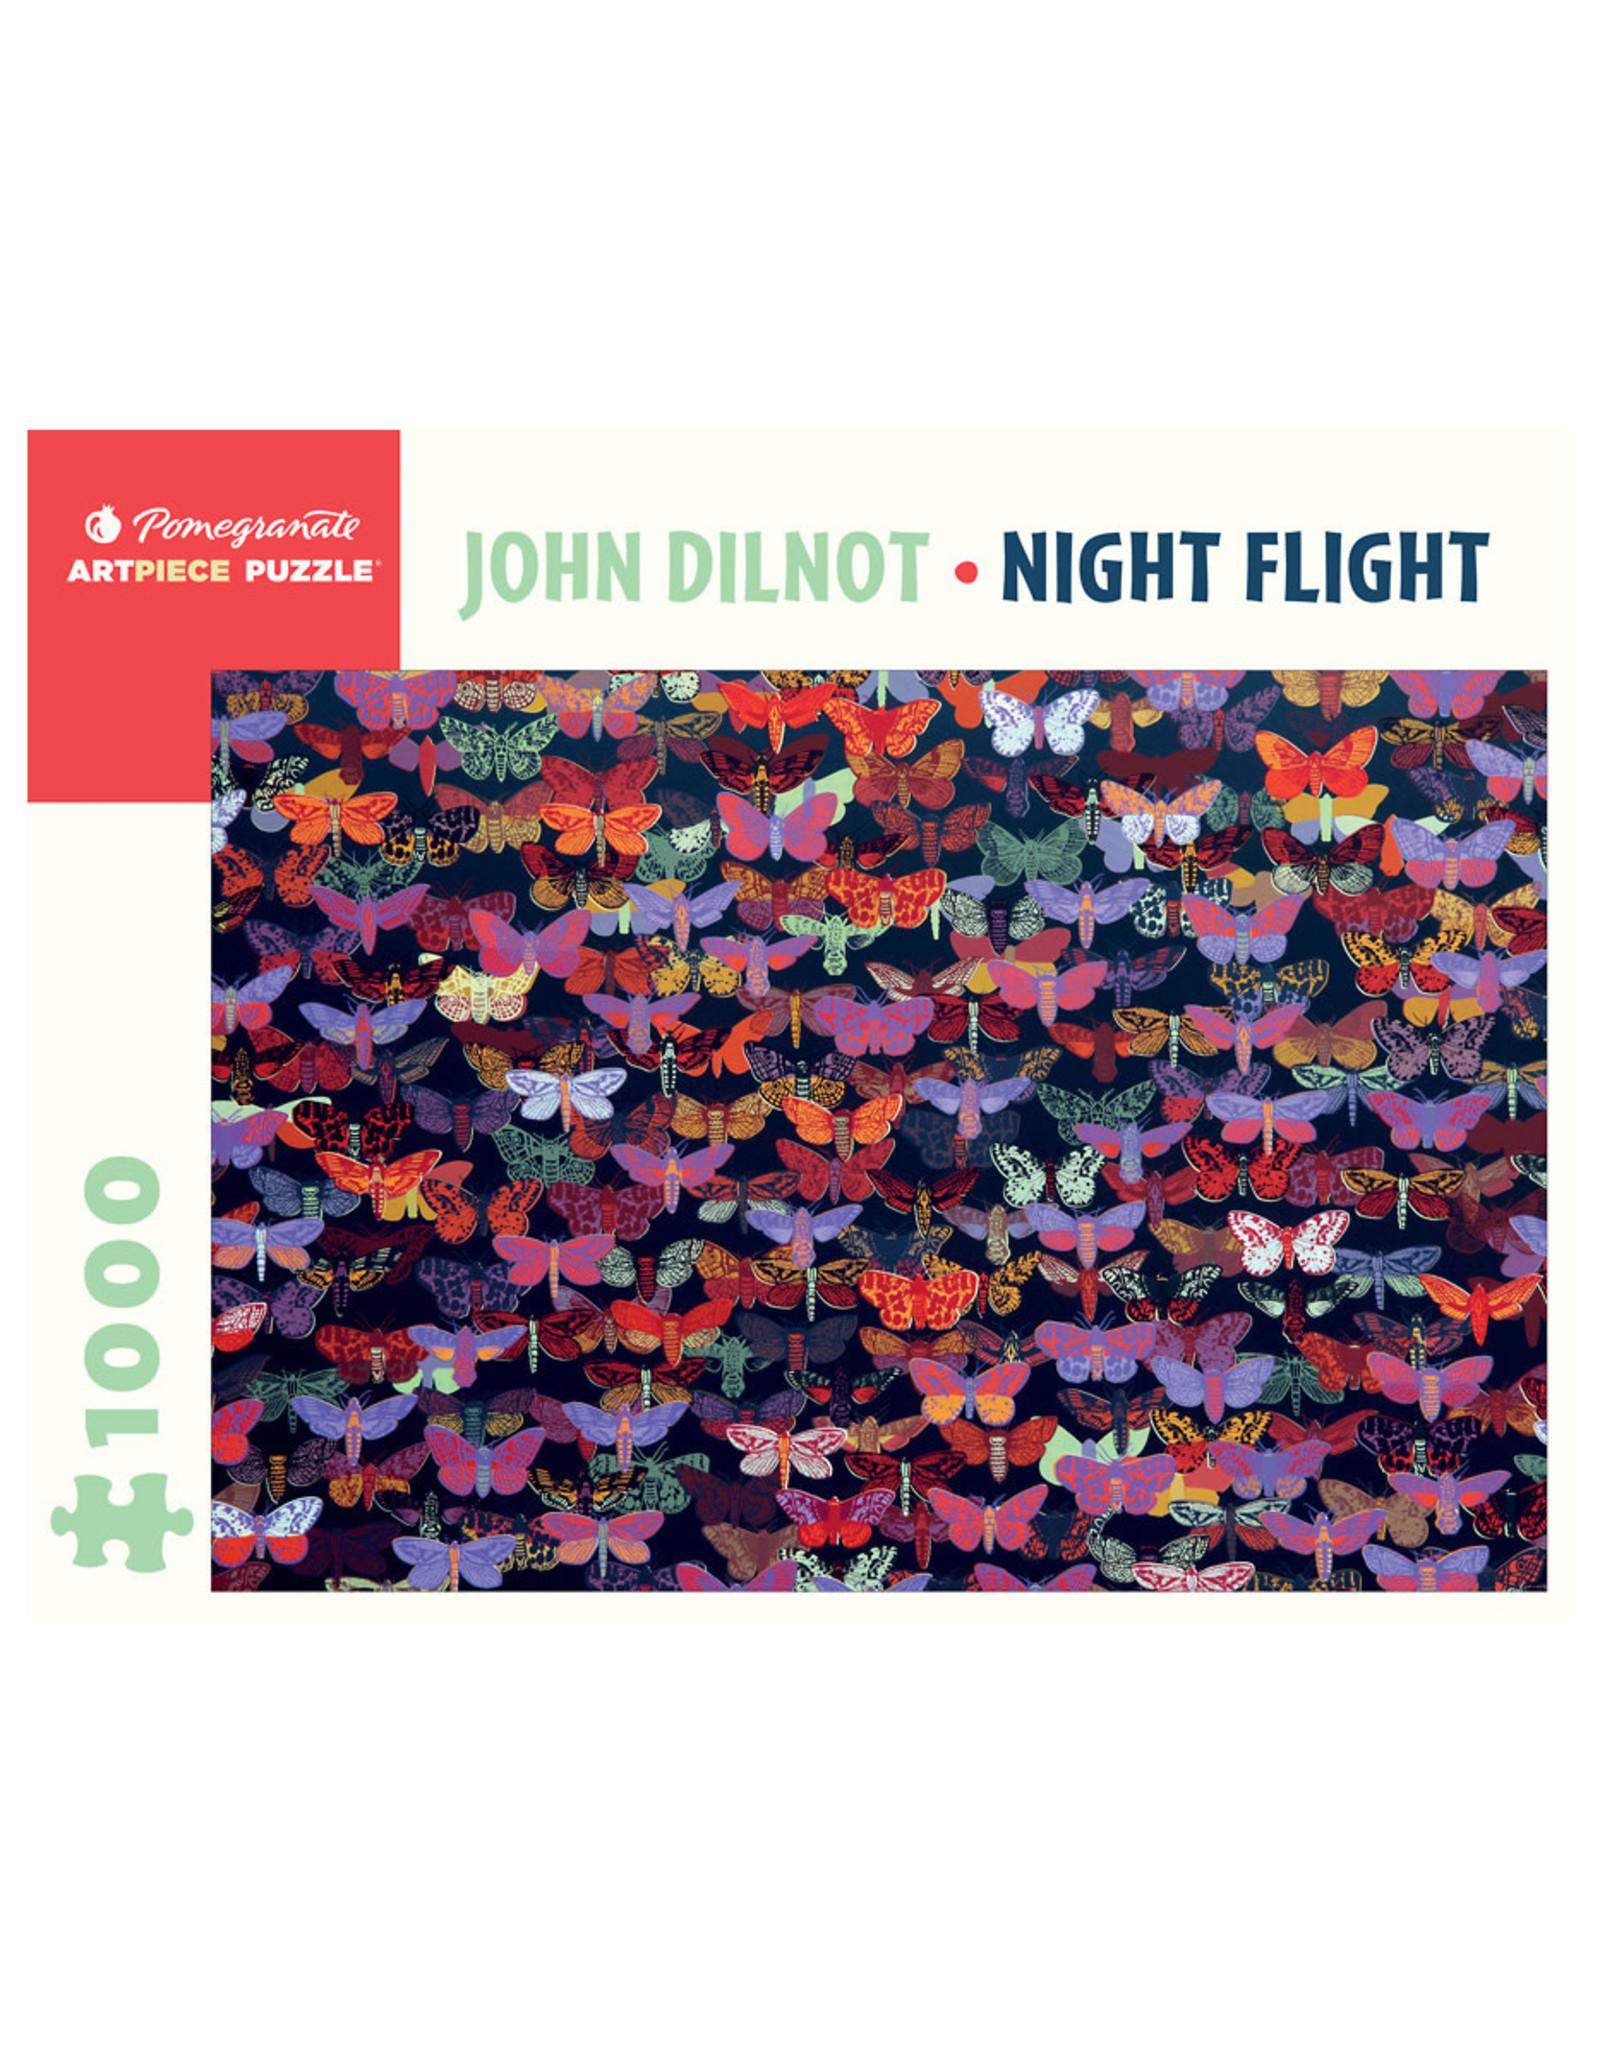 Pomegranate John Dilnot: Night Flight 1000-Piece Jigsaw Puzzle